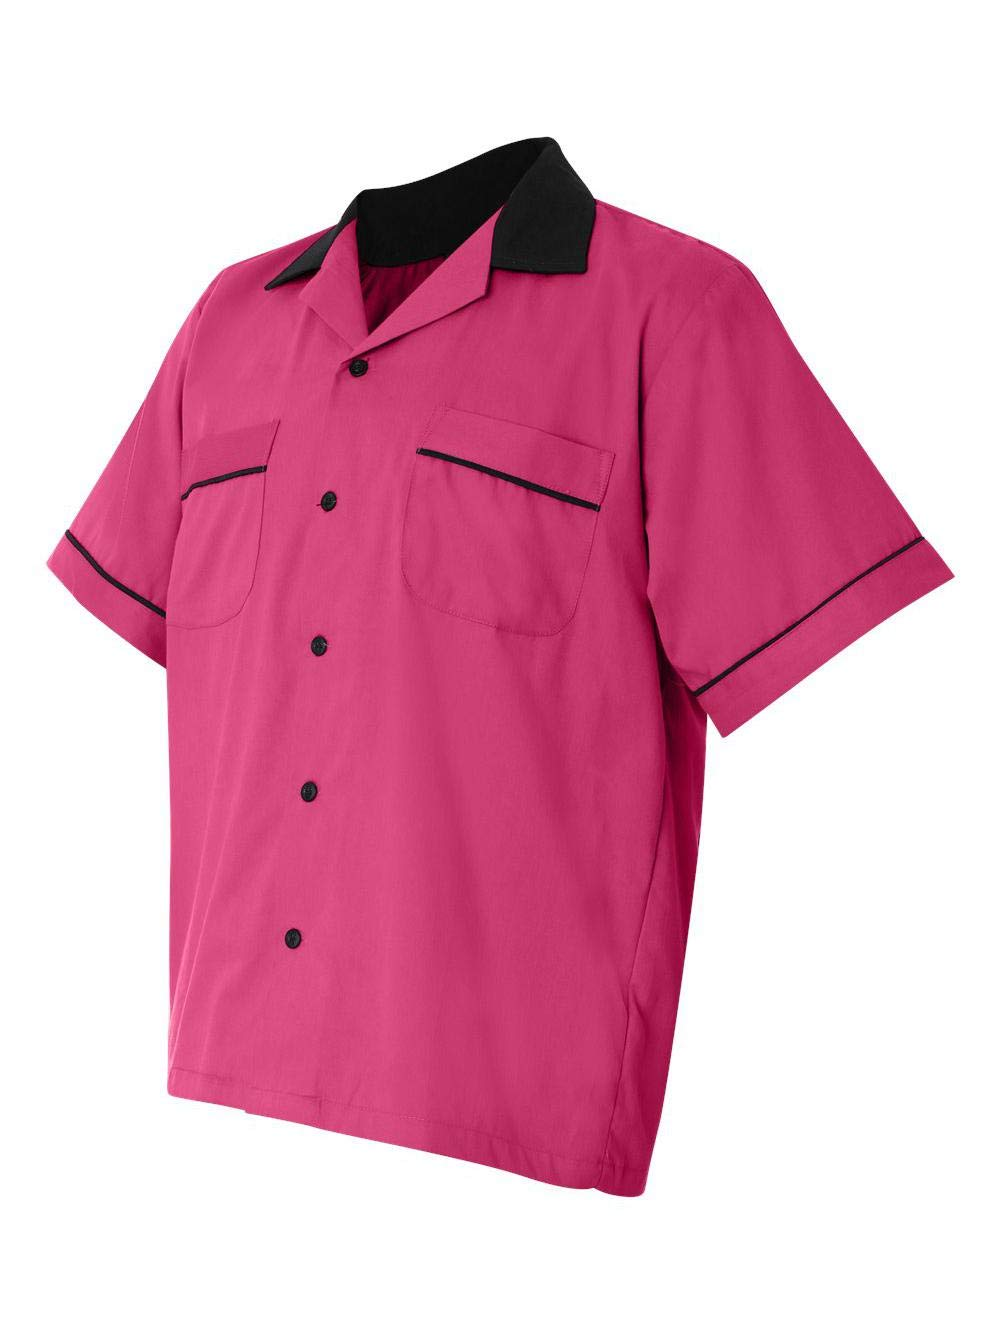 Hilton Bowling Retro Gm Legend (Pink_Black) (S)